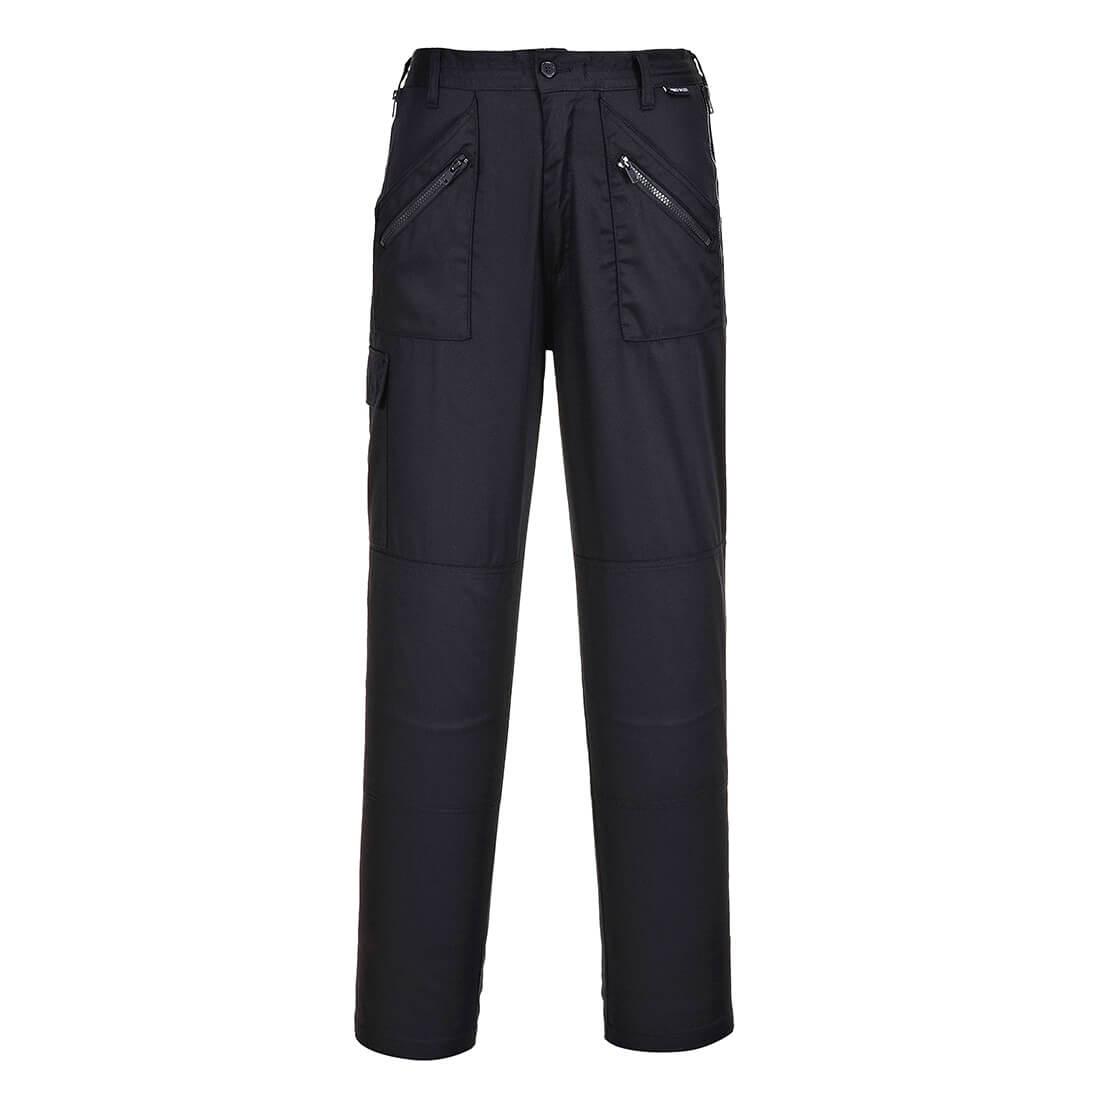 Pantaloni de Dama Action - Imbracaminte de protectie